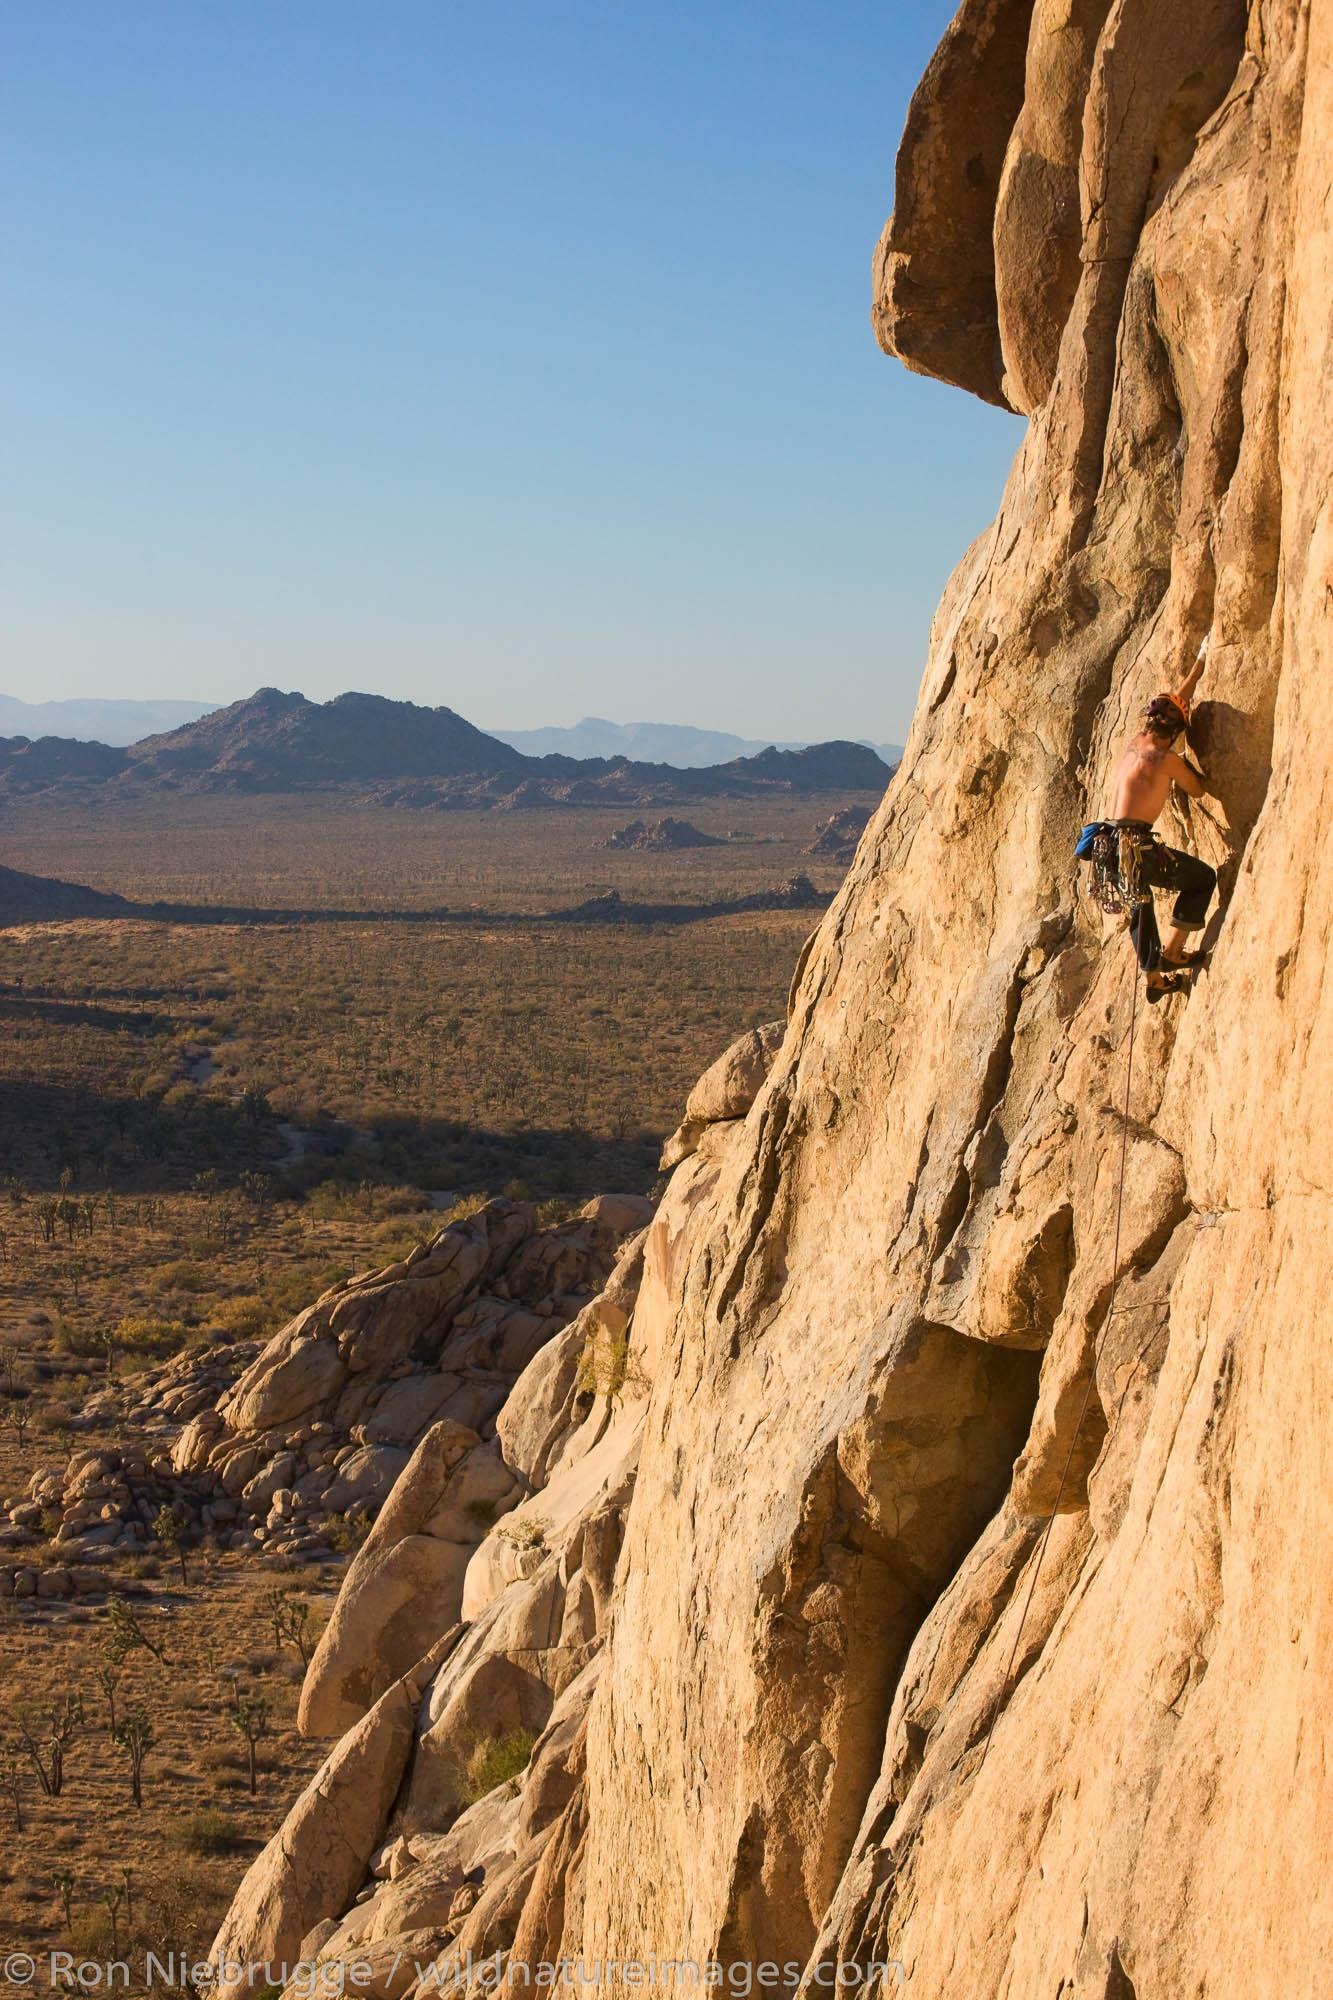 Matt VanBiene rock climbing in Joshua Tree National Park, California.  (model released)